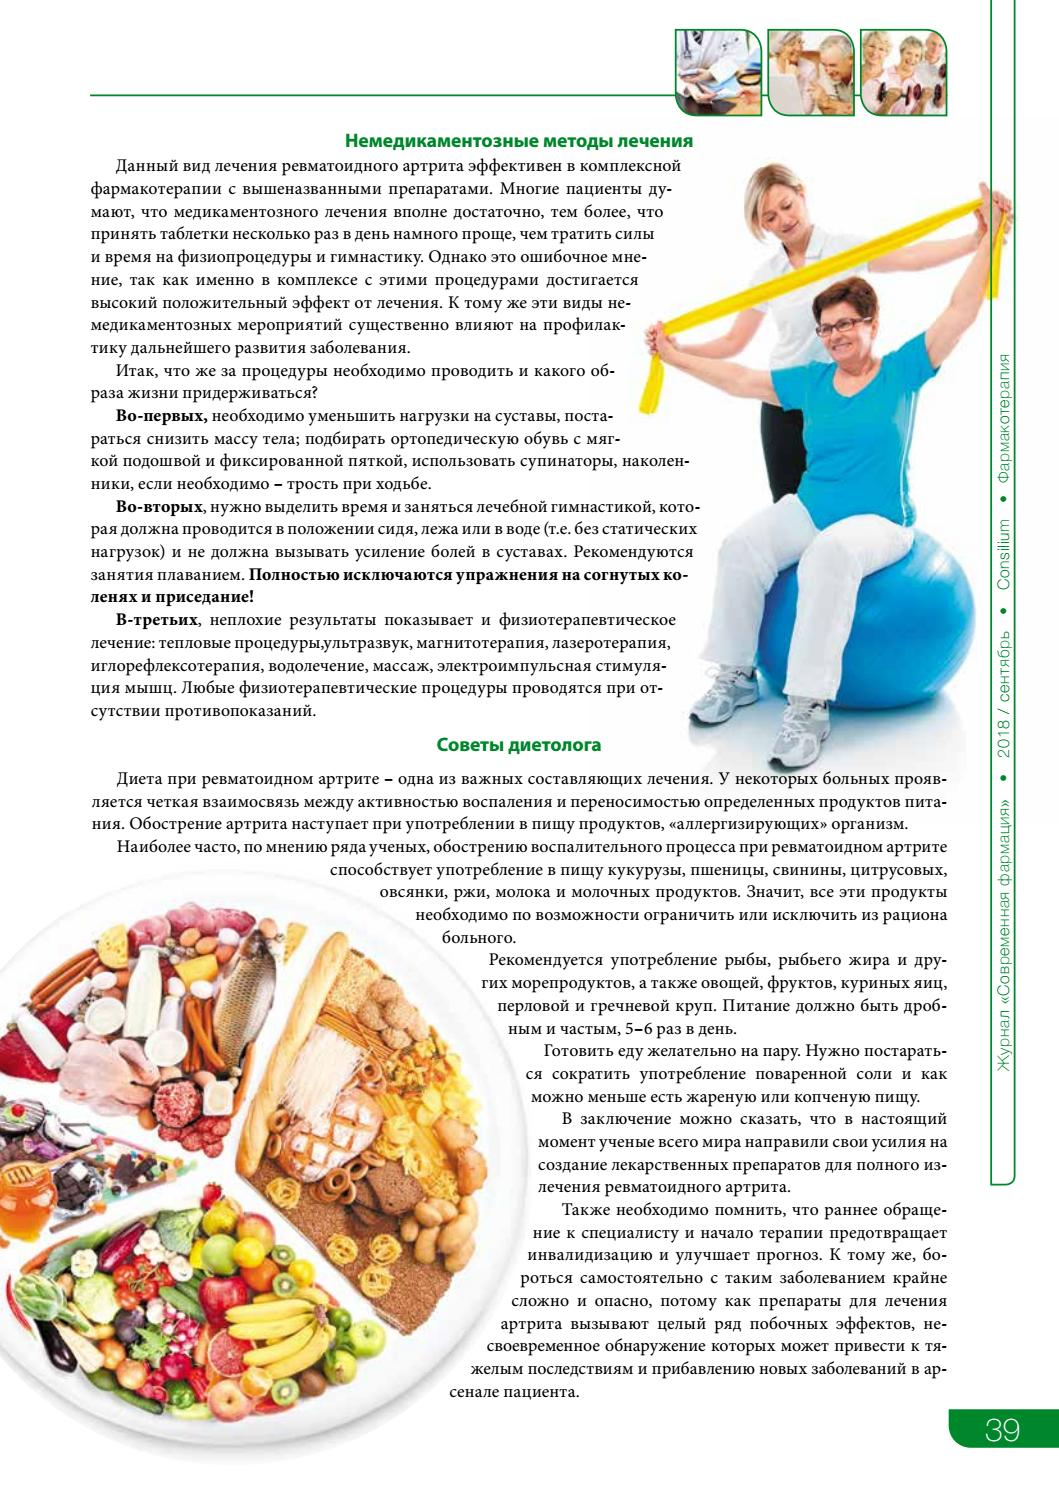 Гимнастика и диета при ревматоидный артрит